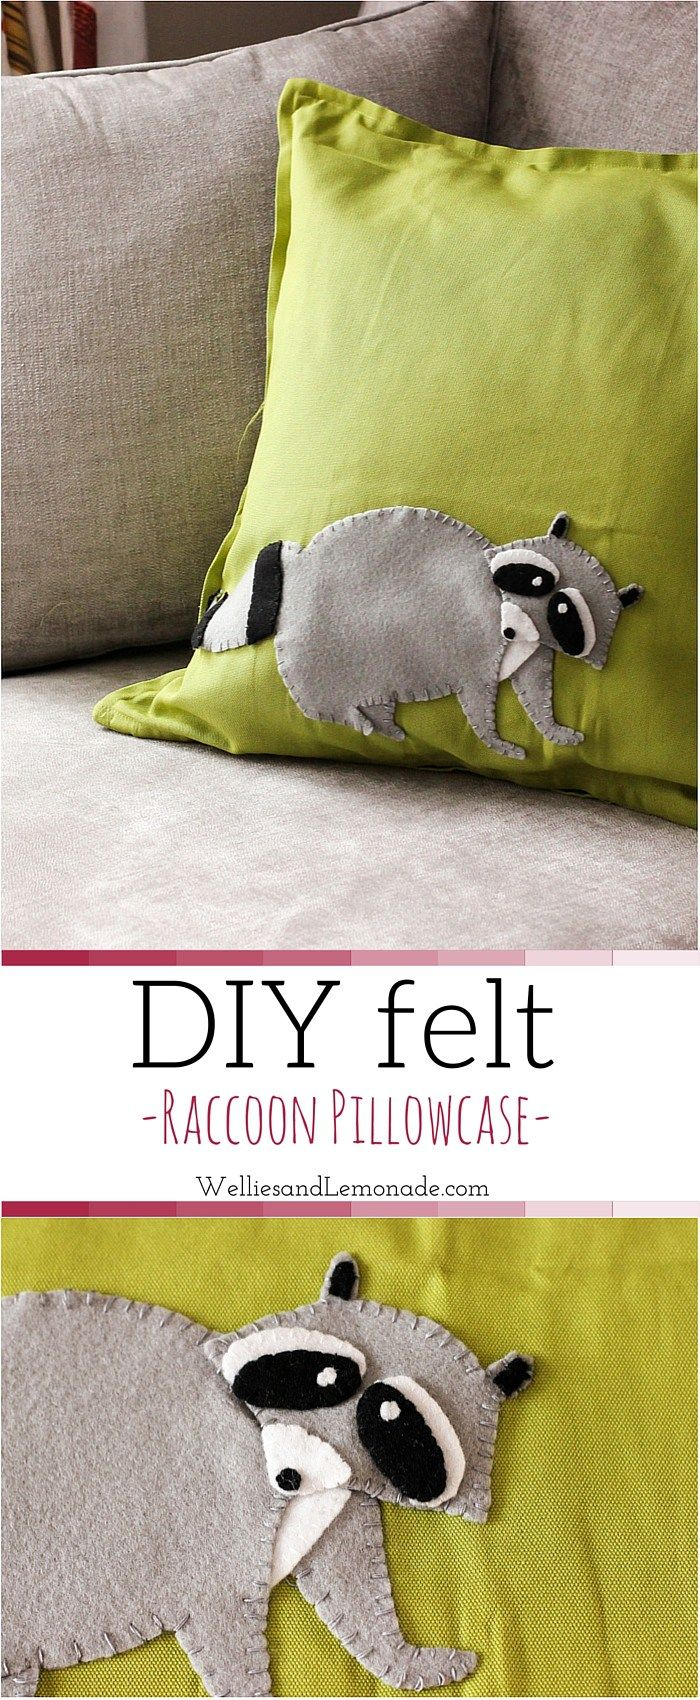 DIY Felt Cushion Case Woodland Creature Part 2 - Raccoon